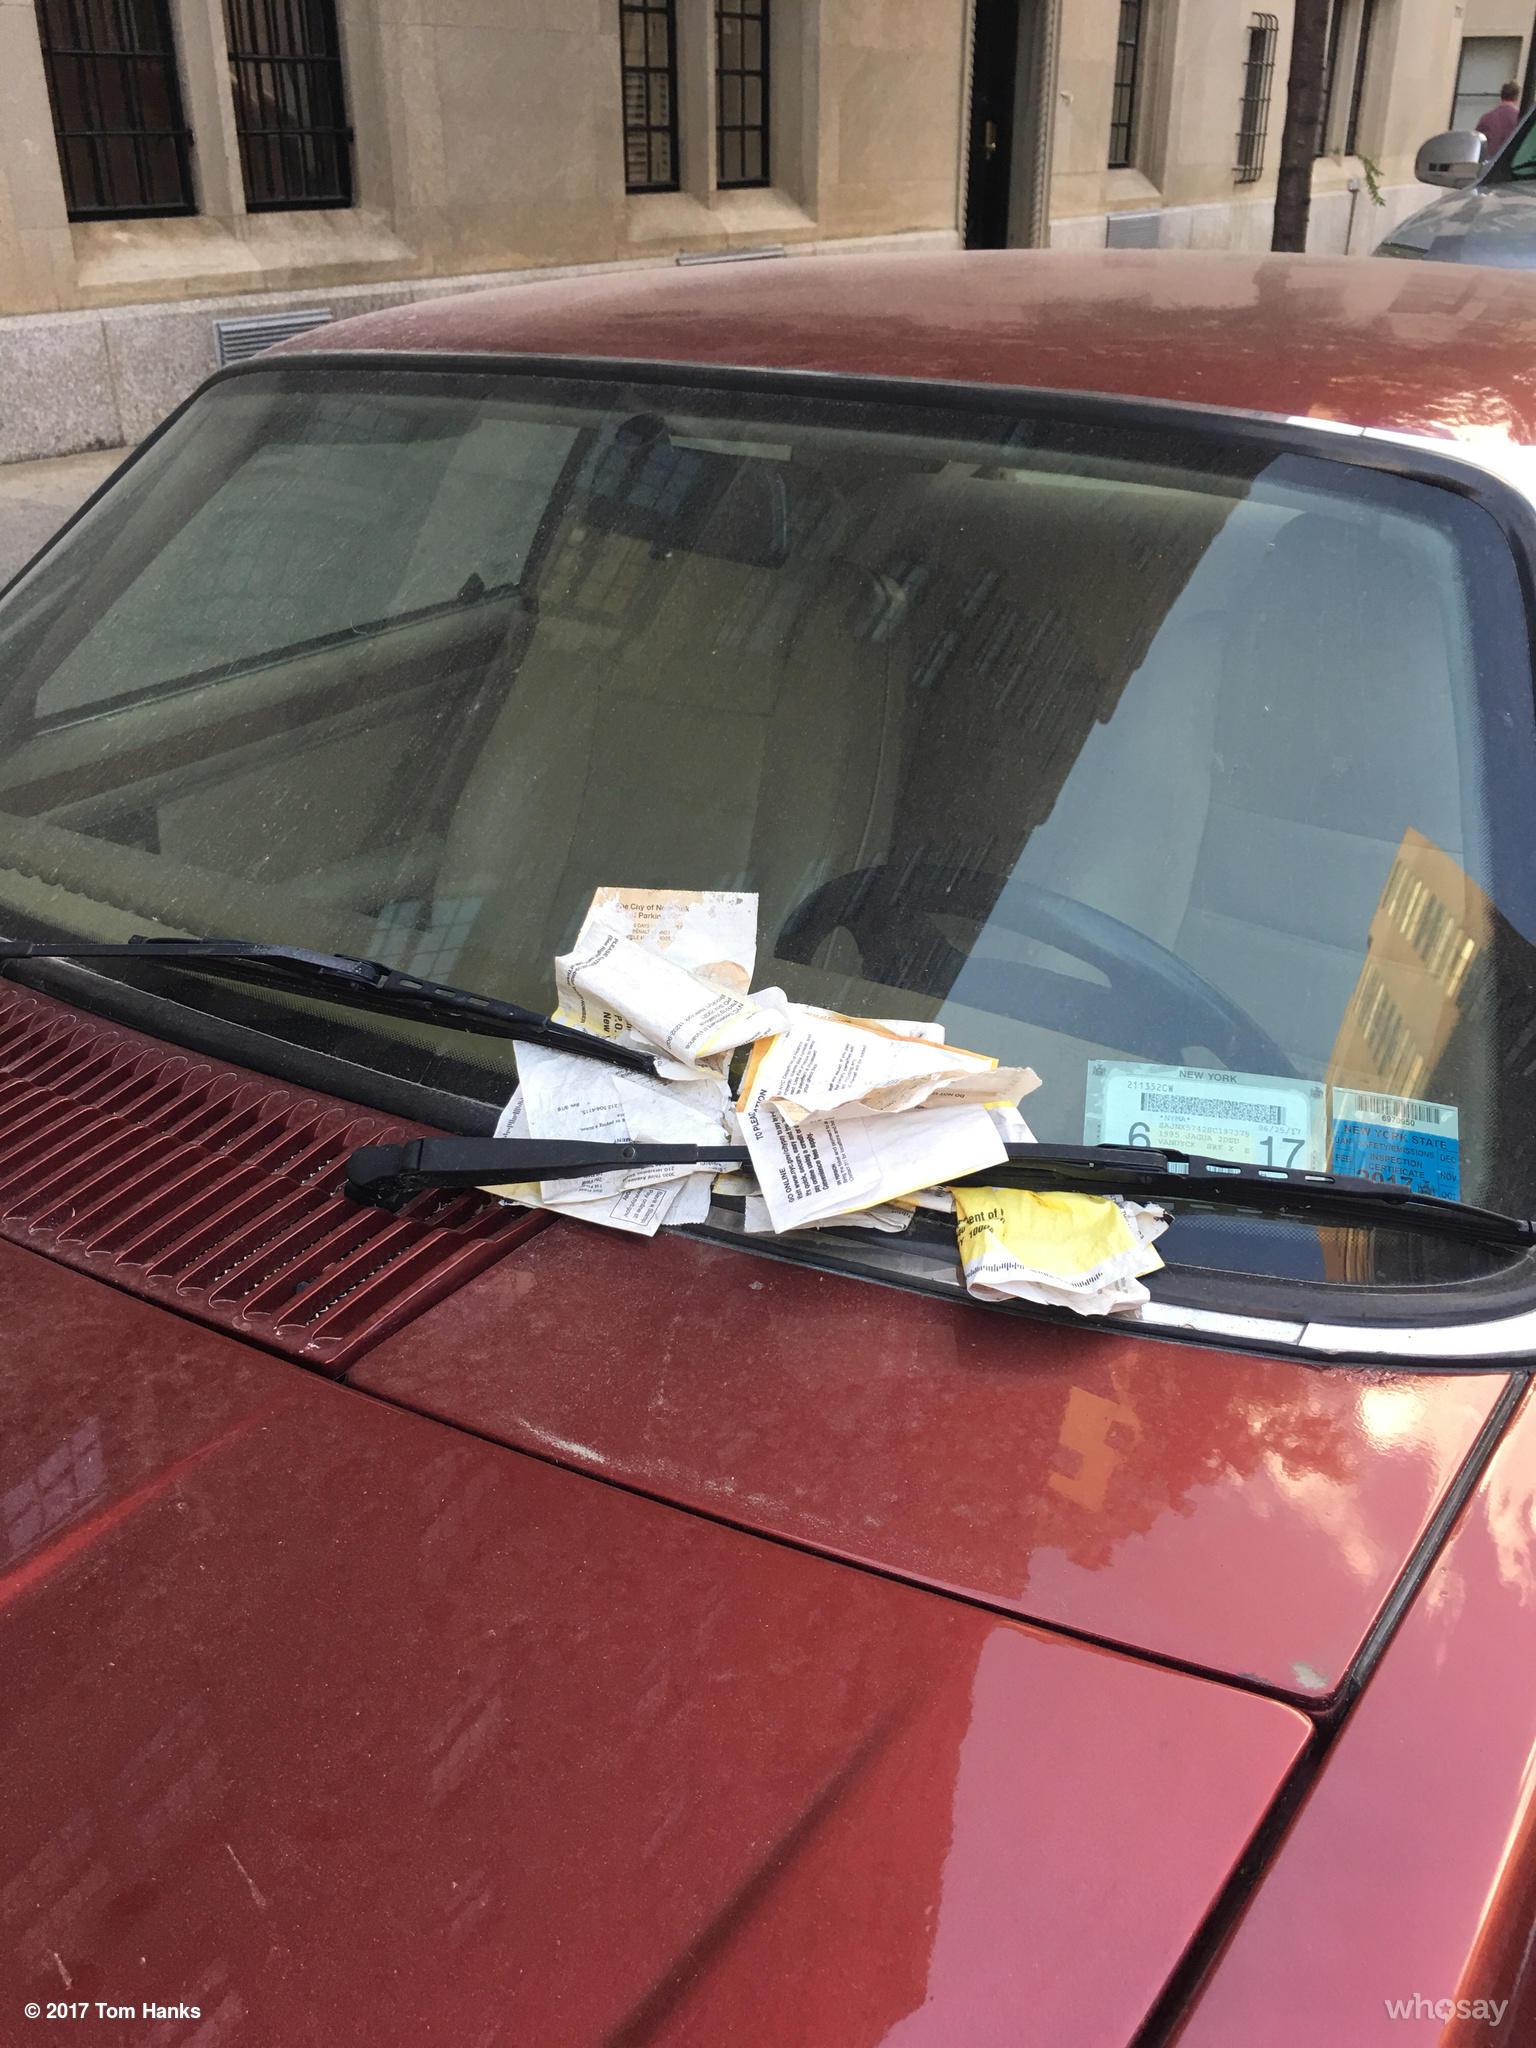 RT @tomhanks: Sir?  Move. Your. Car!  Hanx https://t.co/LJ86qW54Z4